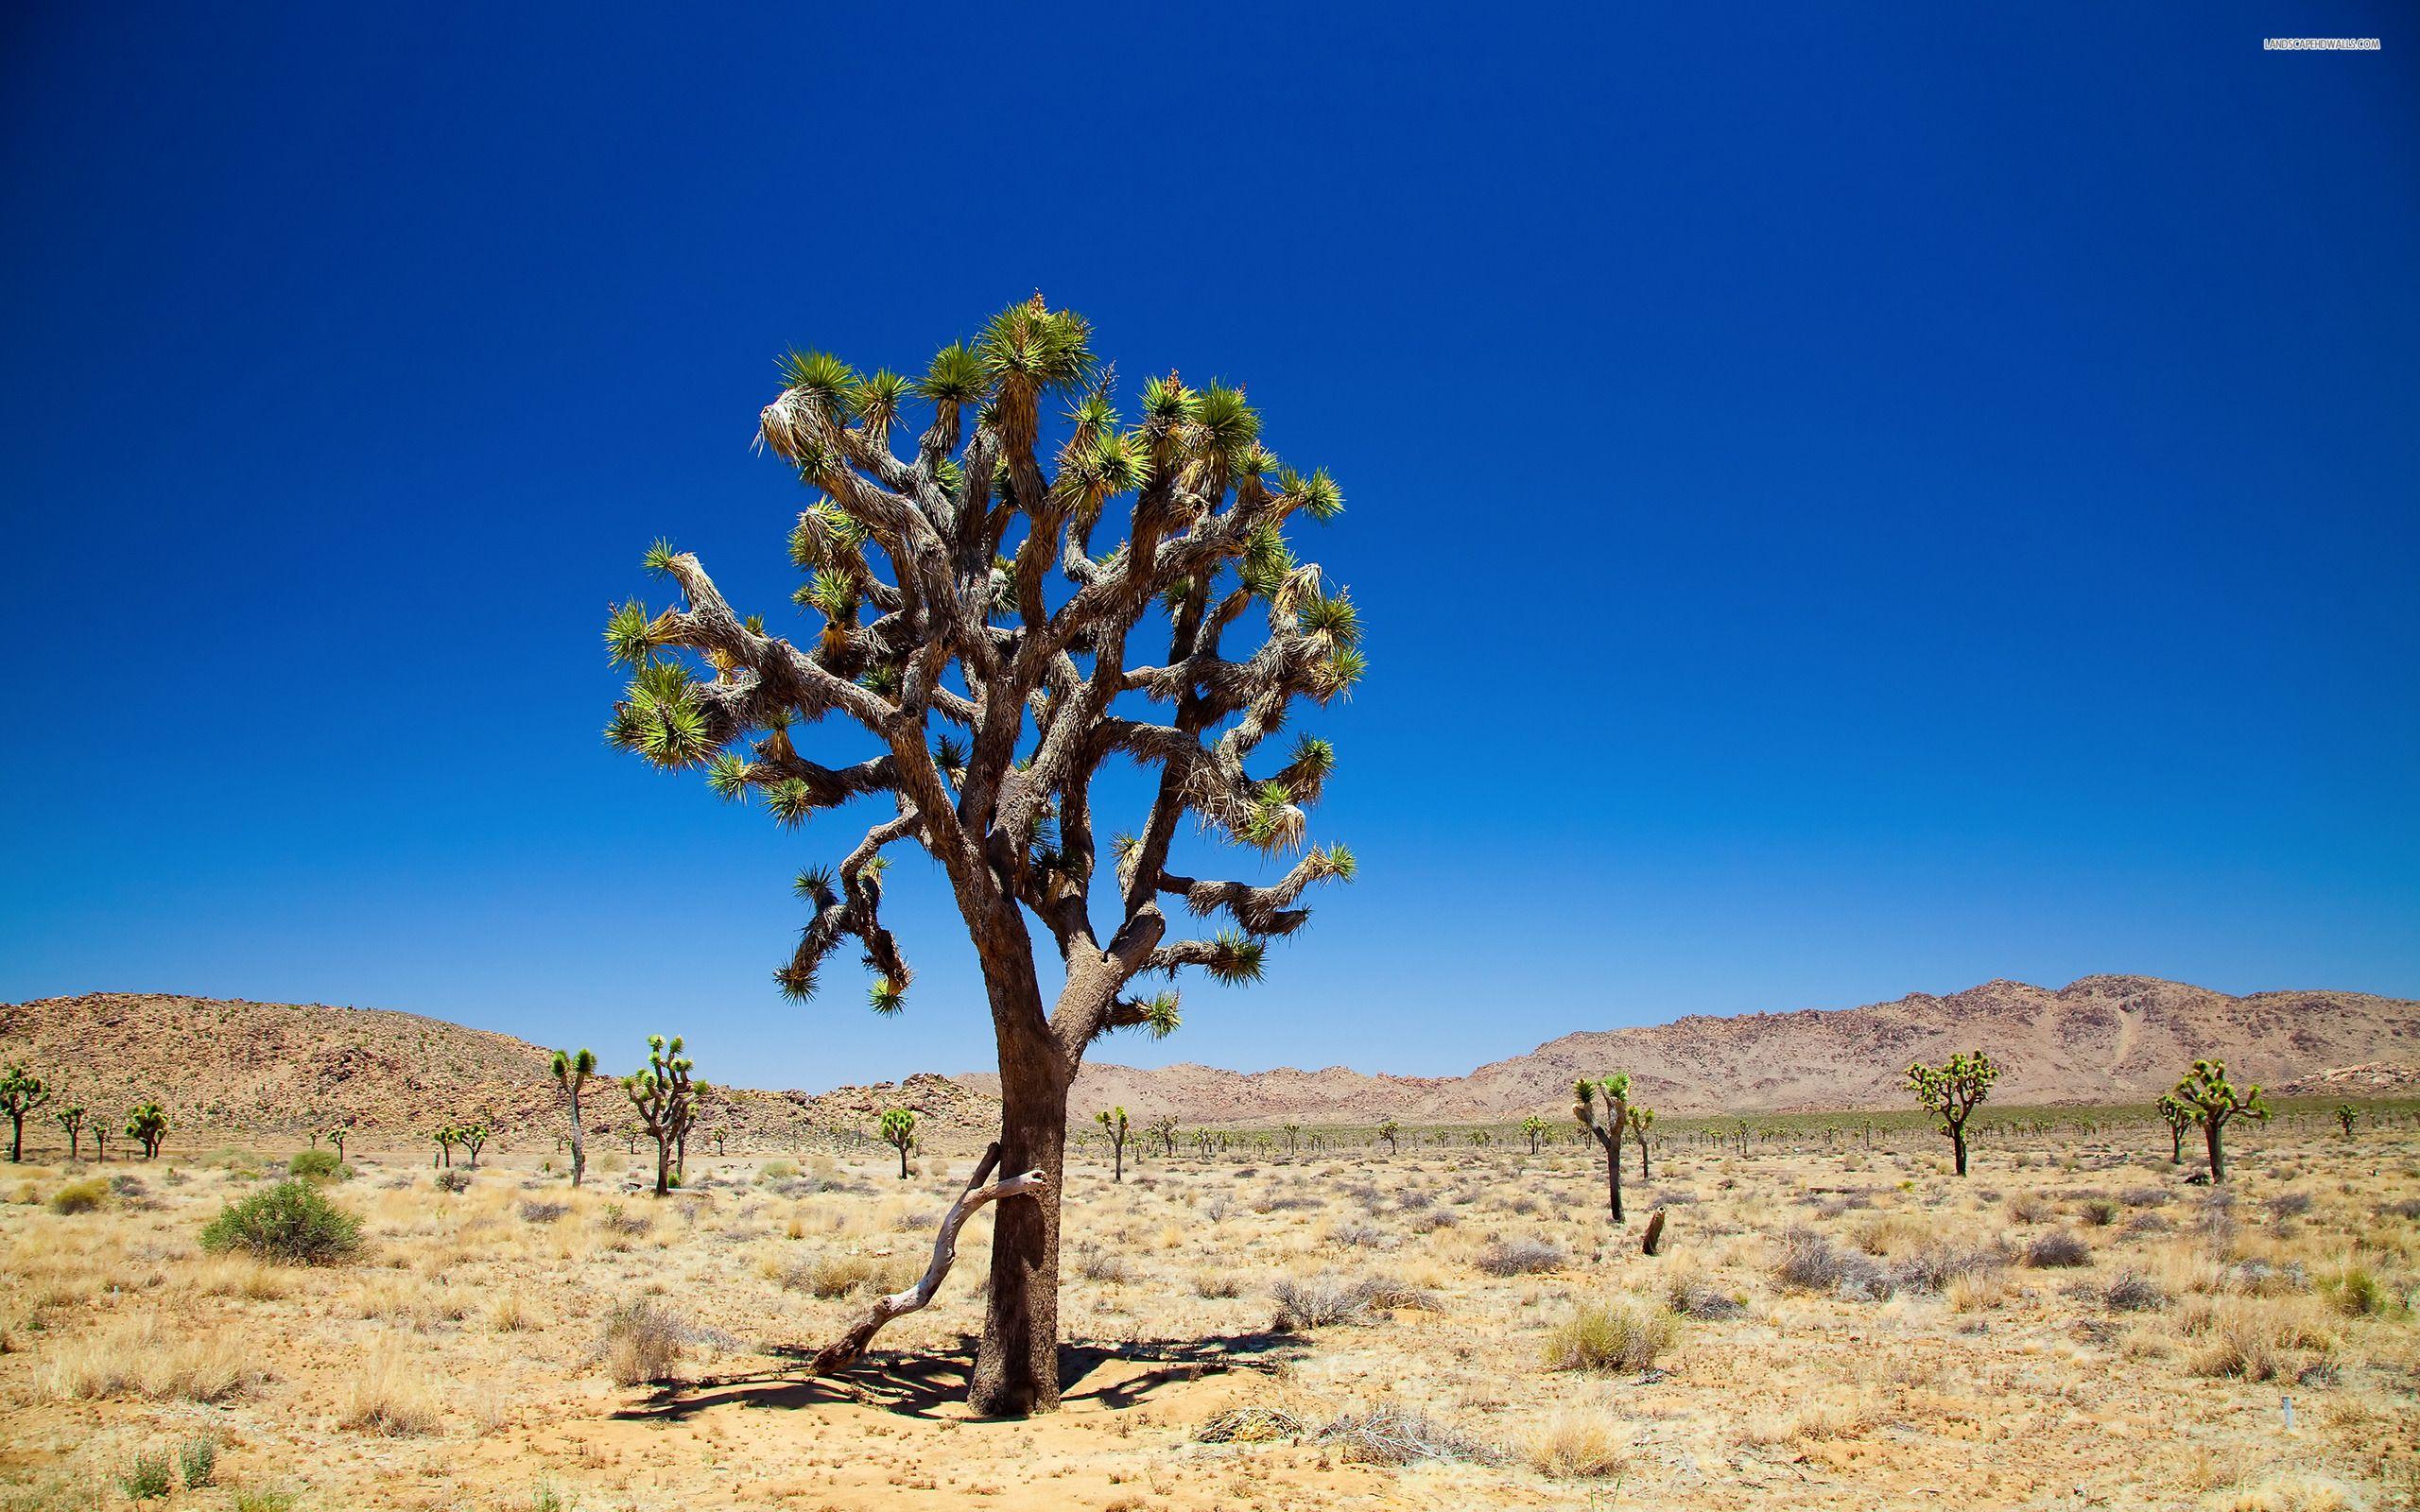 Desert Trees 539 2560 1600 Hd Wallpaper Joshua Tree National Park Joshua Tree Wallpaper Desert Trees